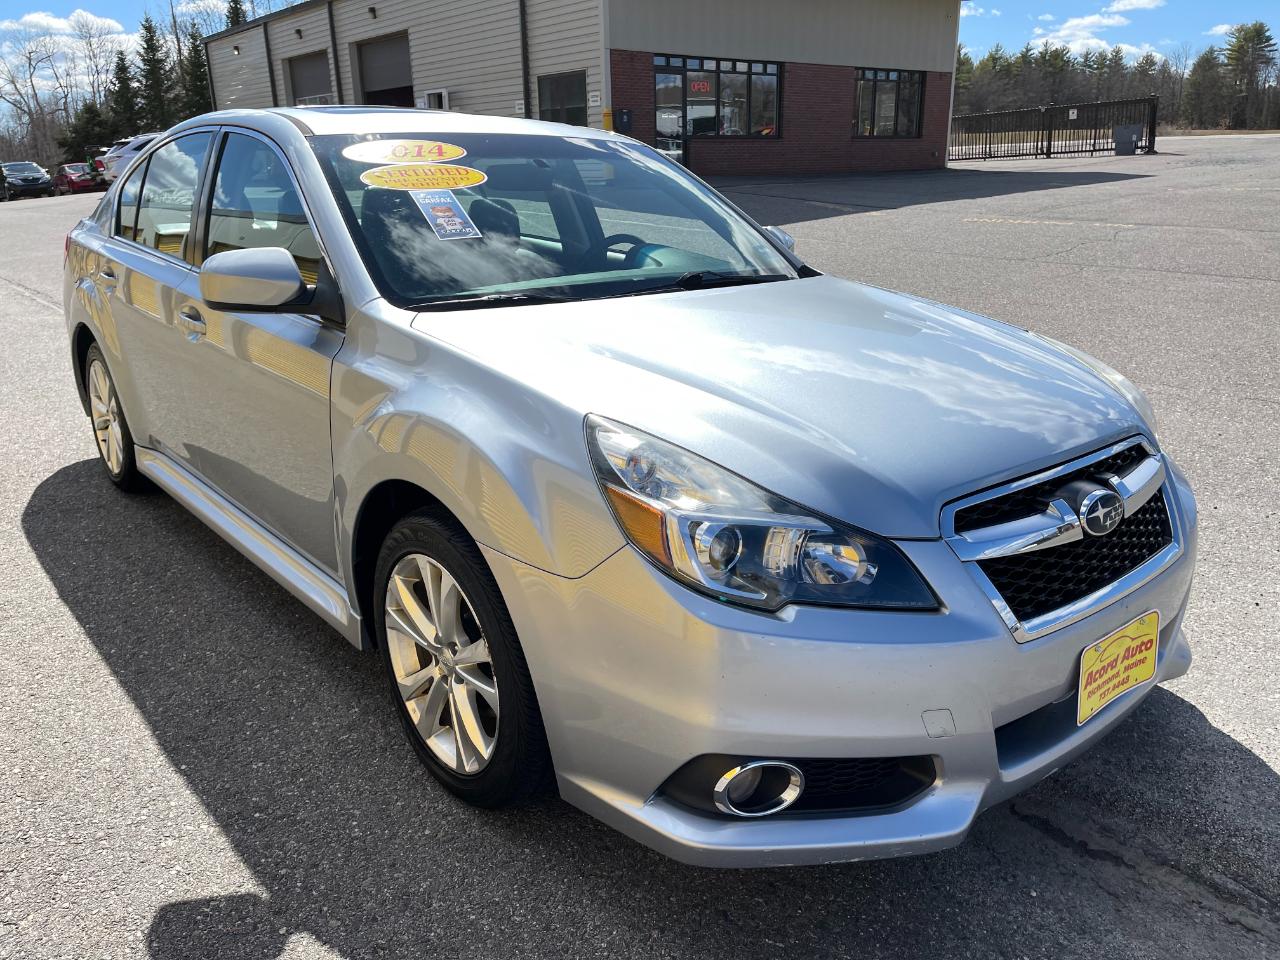 Subaru Legacy 4dr Sdn H4 Auto 2.5i Limited 2014